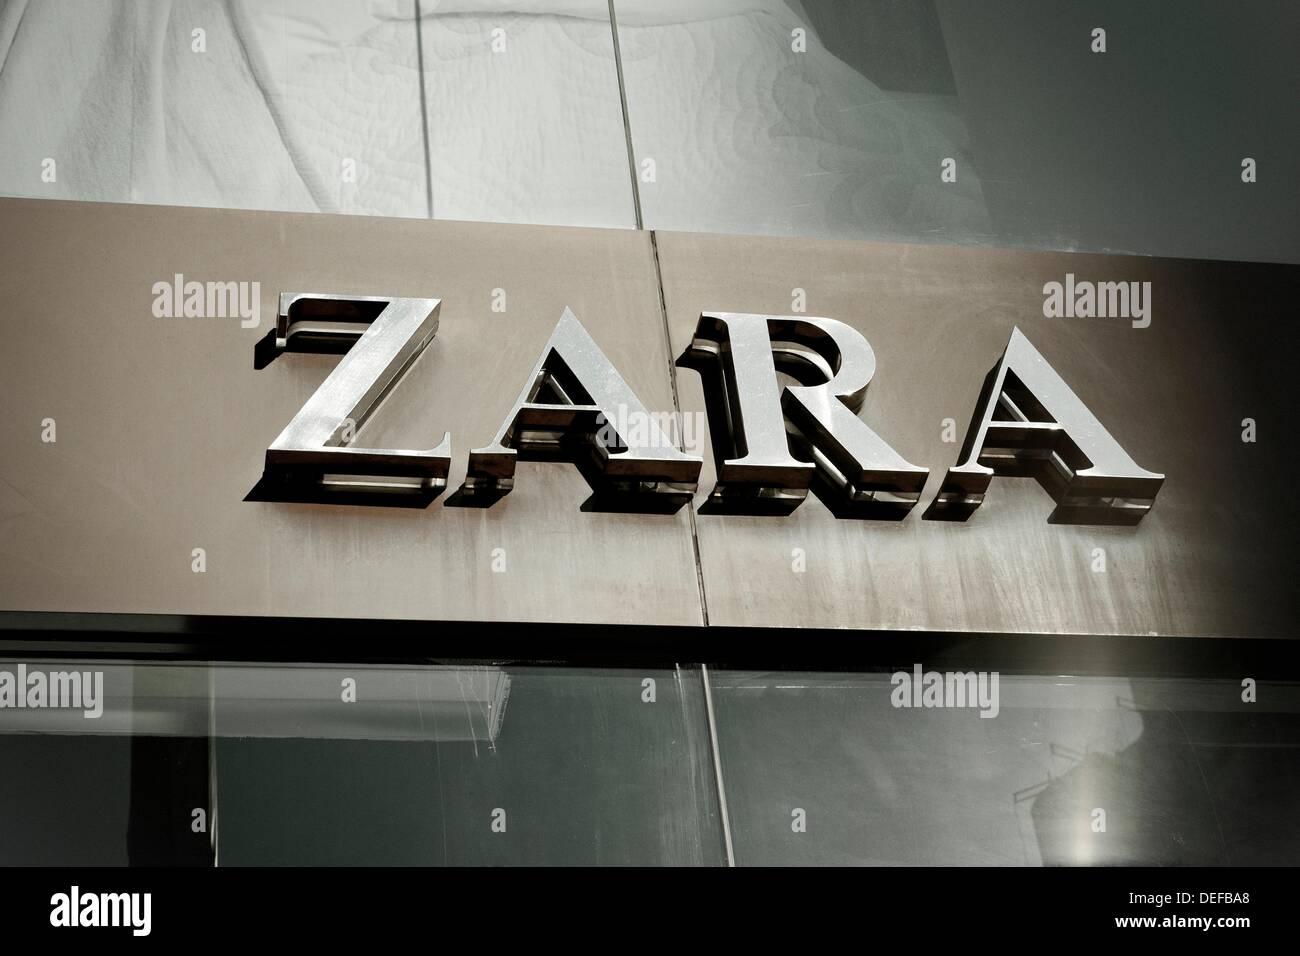 Zara Stock Photos Zara Stock Images Alamy